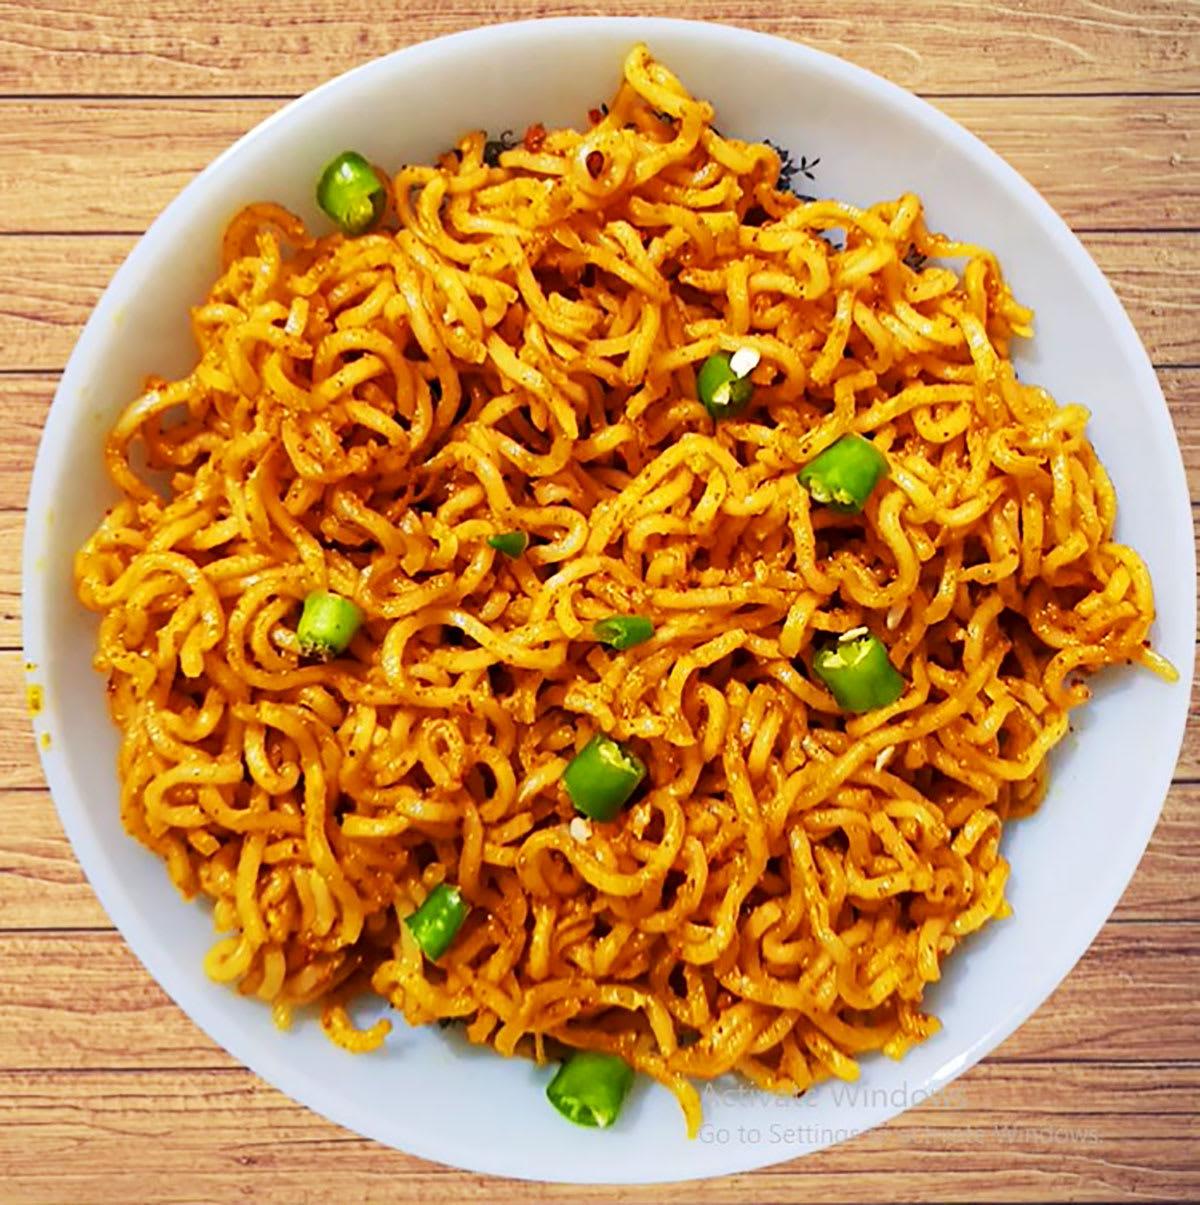 Maggie S Kitchen Home Delivery Order Online Baga Calangute Baga Calangute North Goa